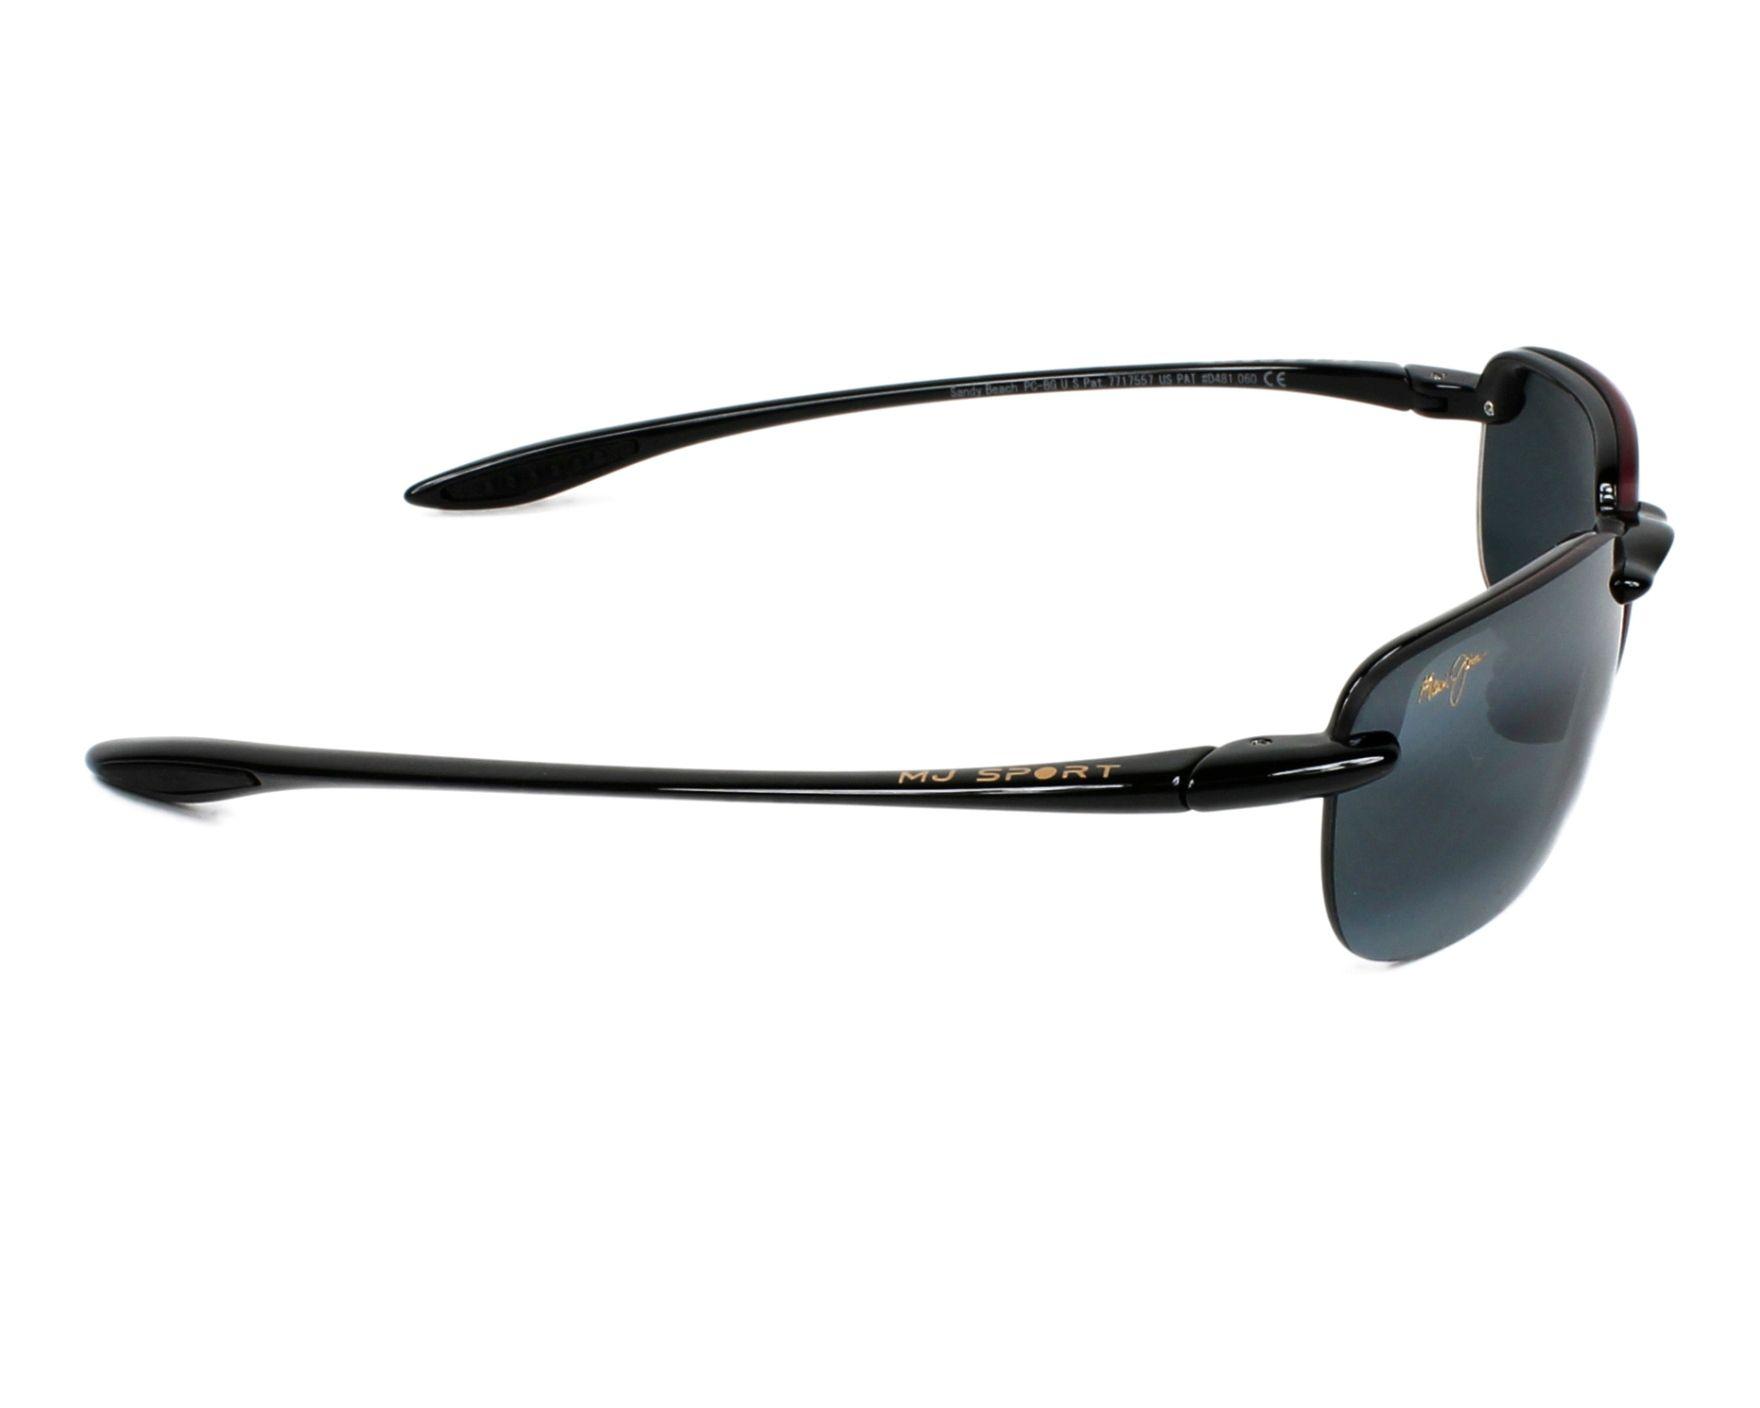 12085b23a05f Sunglasses Maui Jim 408 02 56-15 Black side view